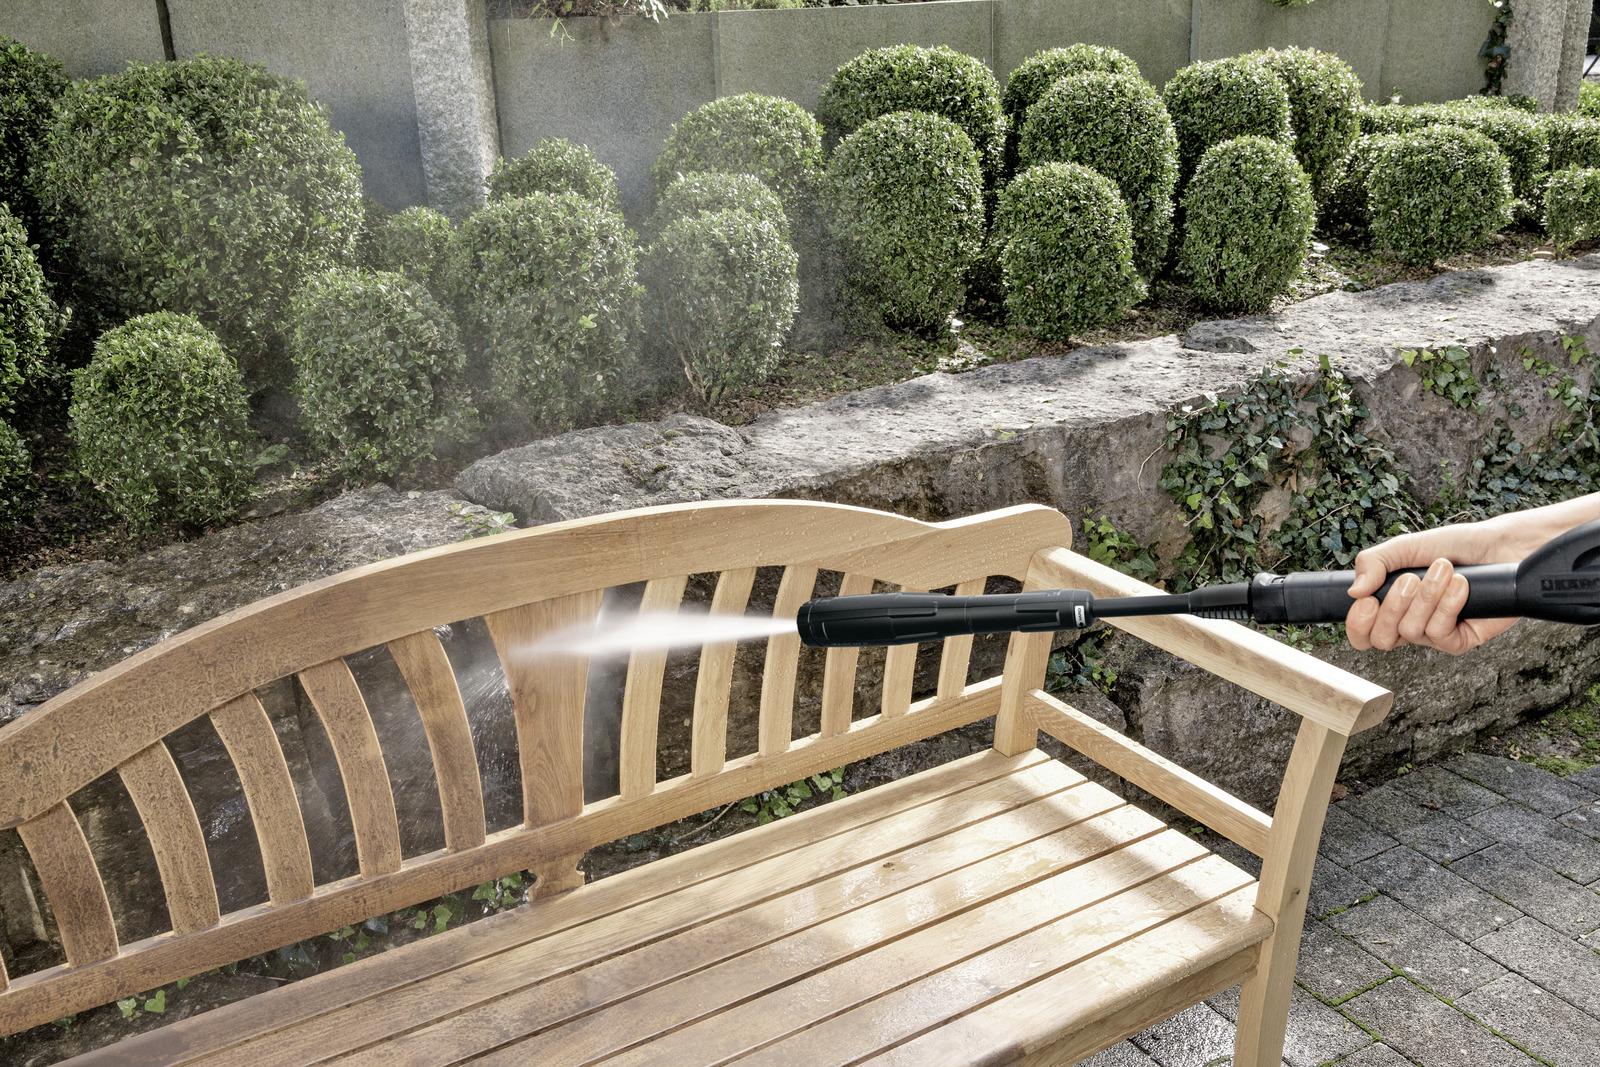 hochdruckreiniger k 5 compact home t 350 k rcher. Black Bedroom Furniture Sets. Home Design Ideas